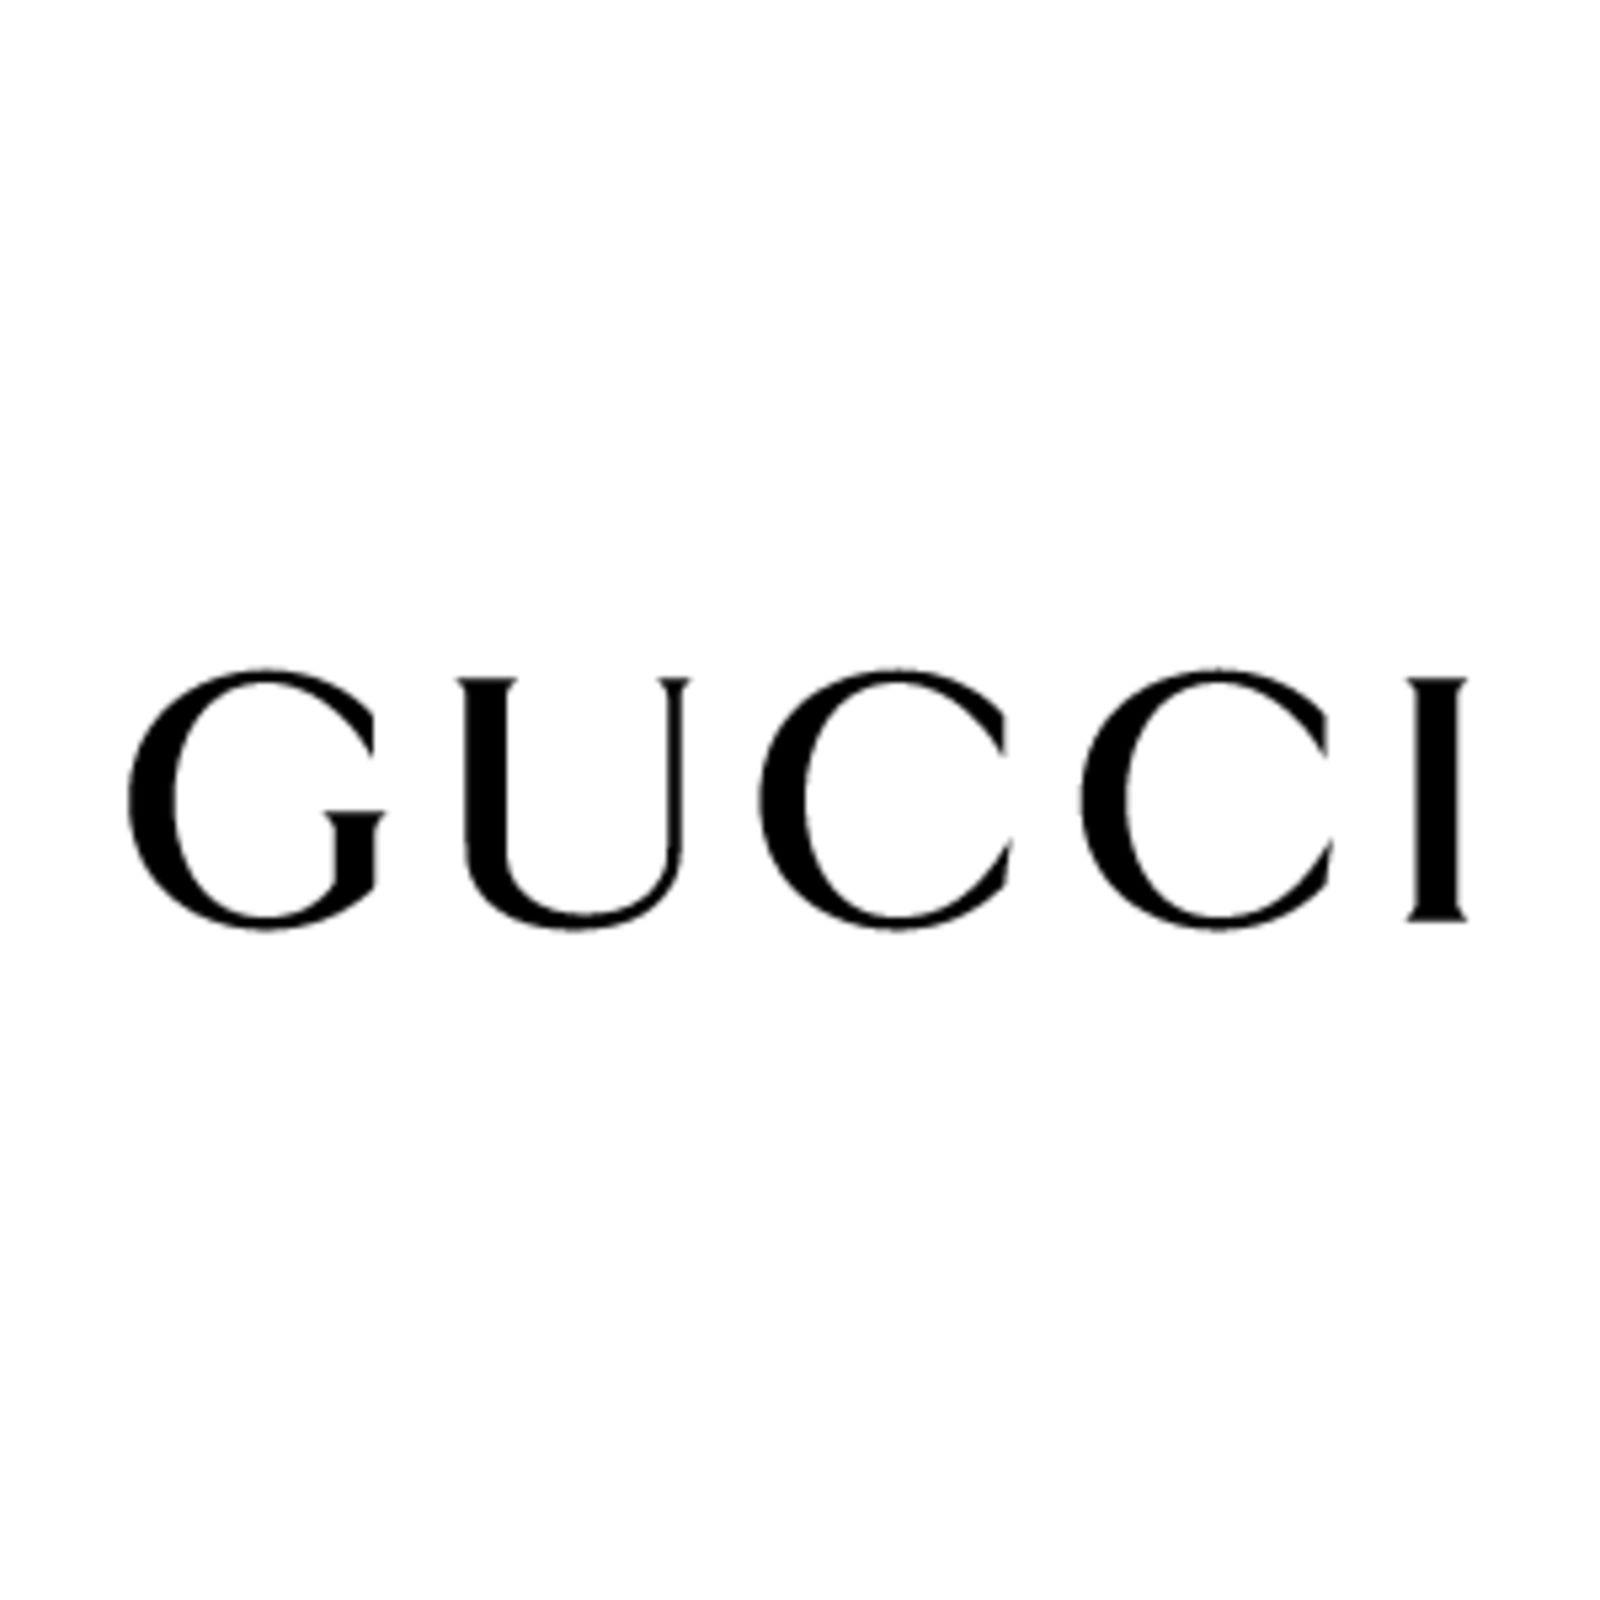 GUCCI (Imagen 1)